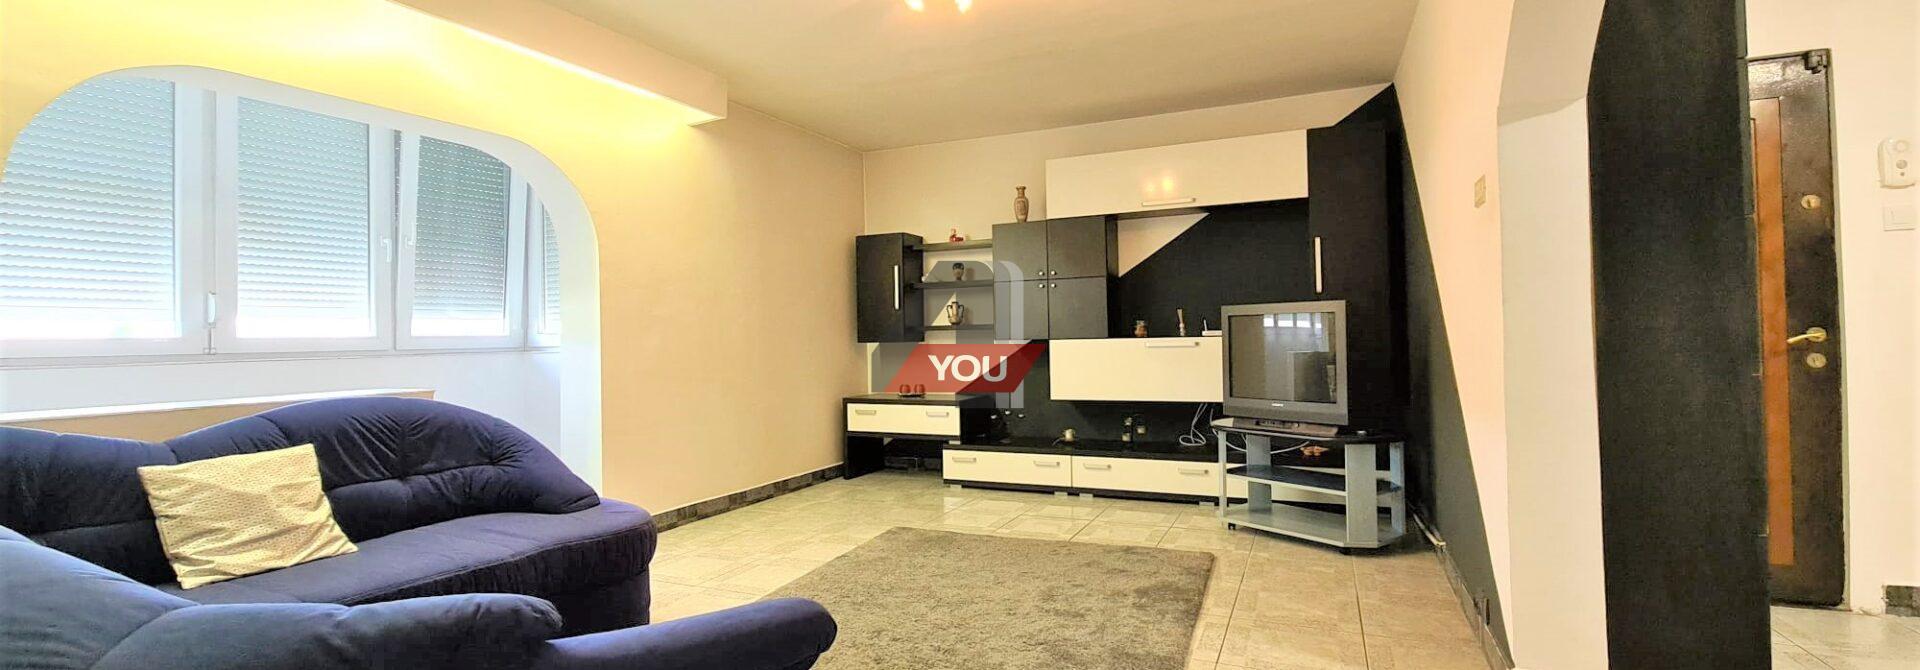 Apartament Arad 3 camere renovat Termoteca Vlaicu Fortuna pret 250 euro/luna